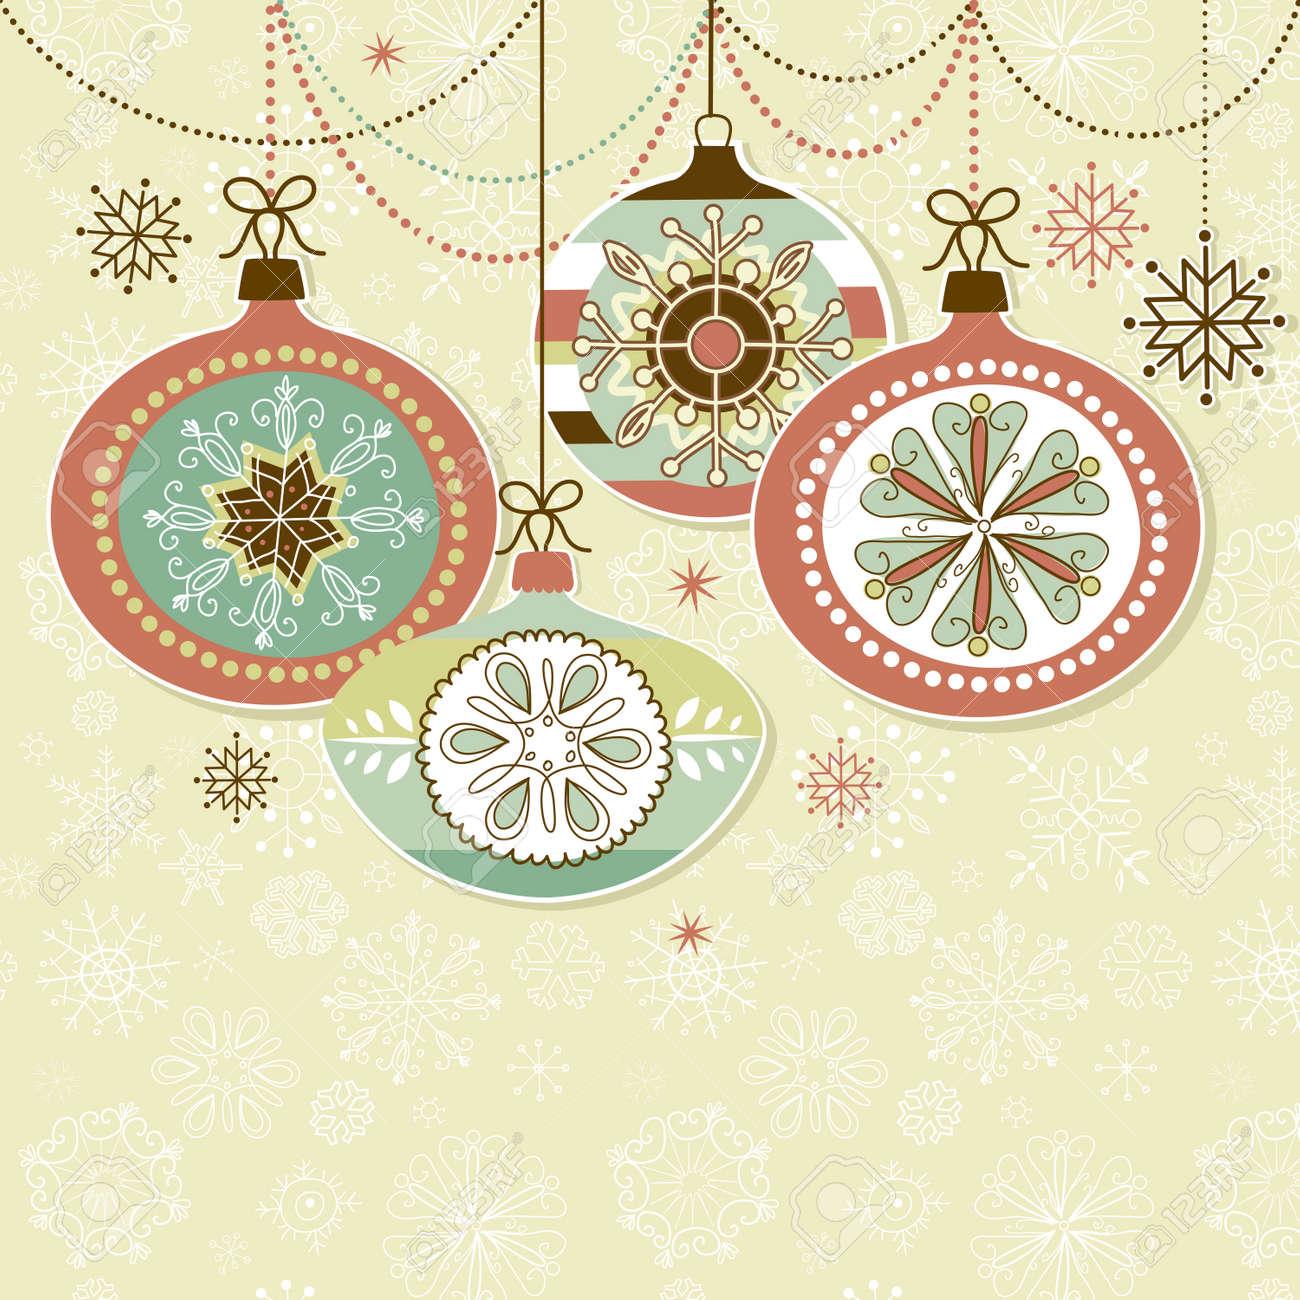 Retro Christmas Ornaments Royalty Free Cliparts, Vectors, And ...